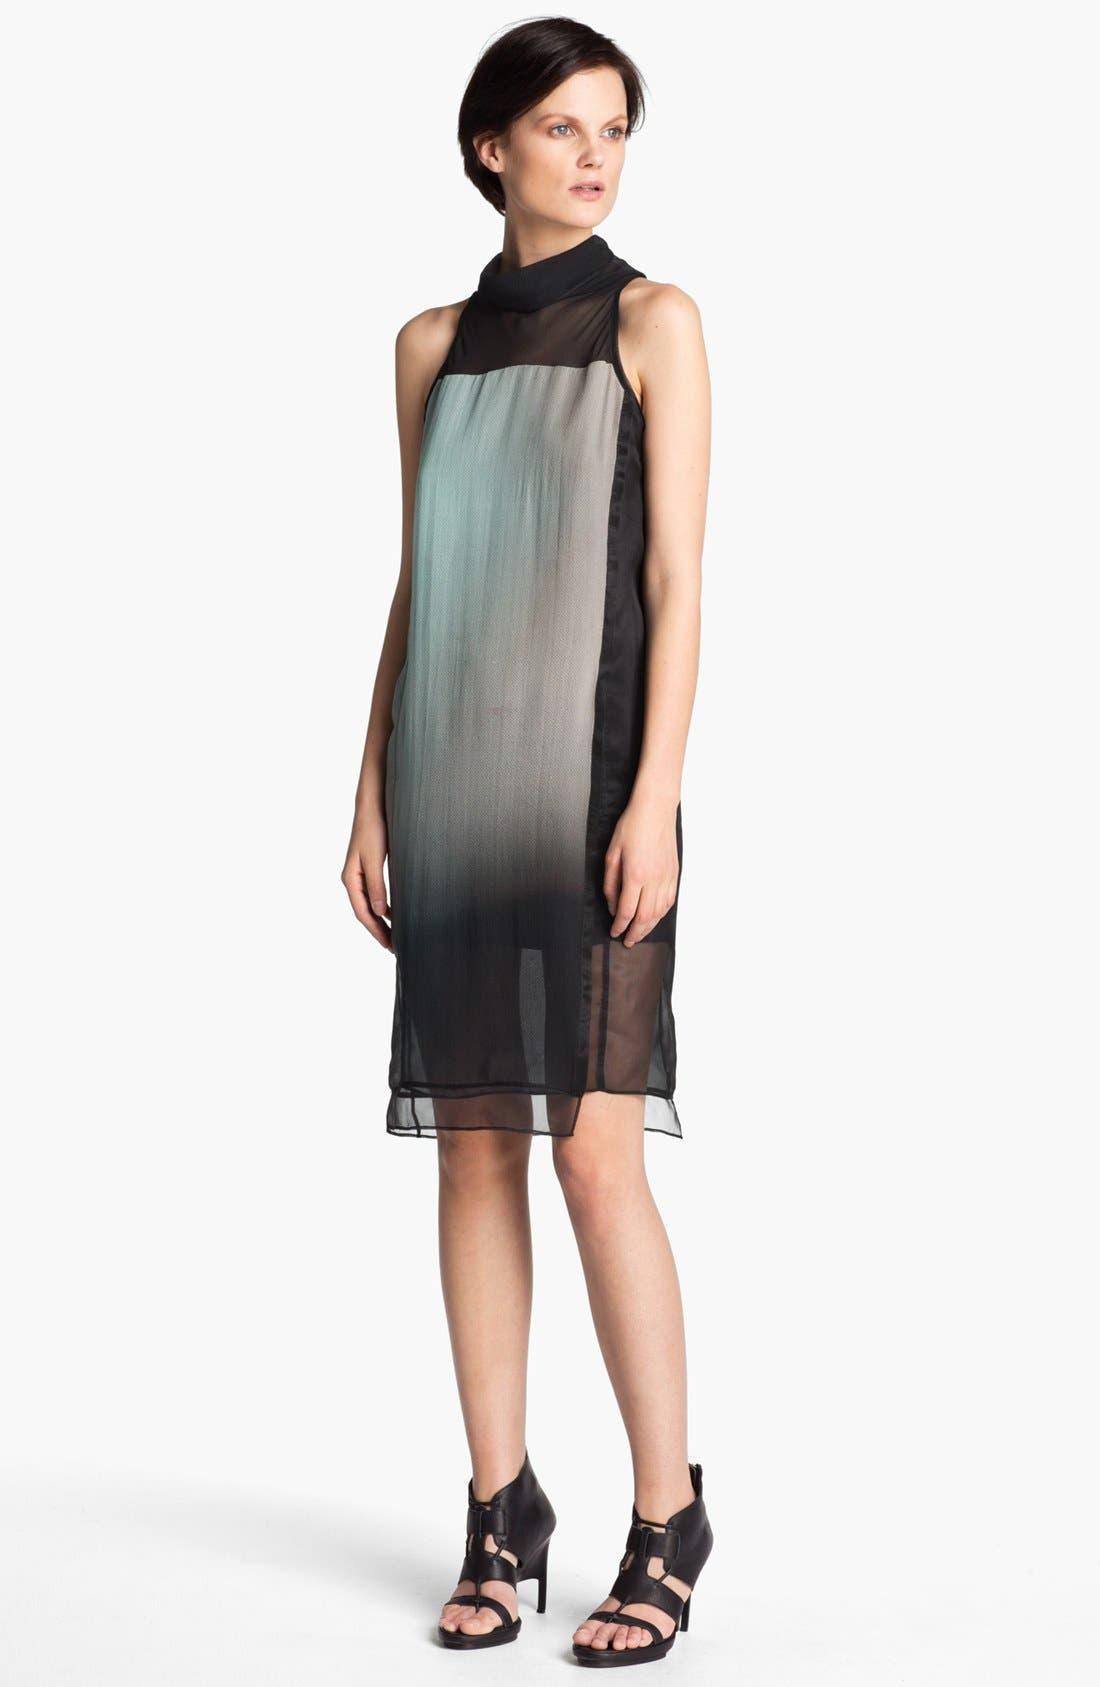 Alternate Image 1 Selected - Helmut Lang 'Mercury' Ombré Organza Dress